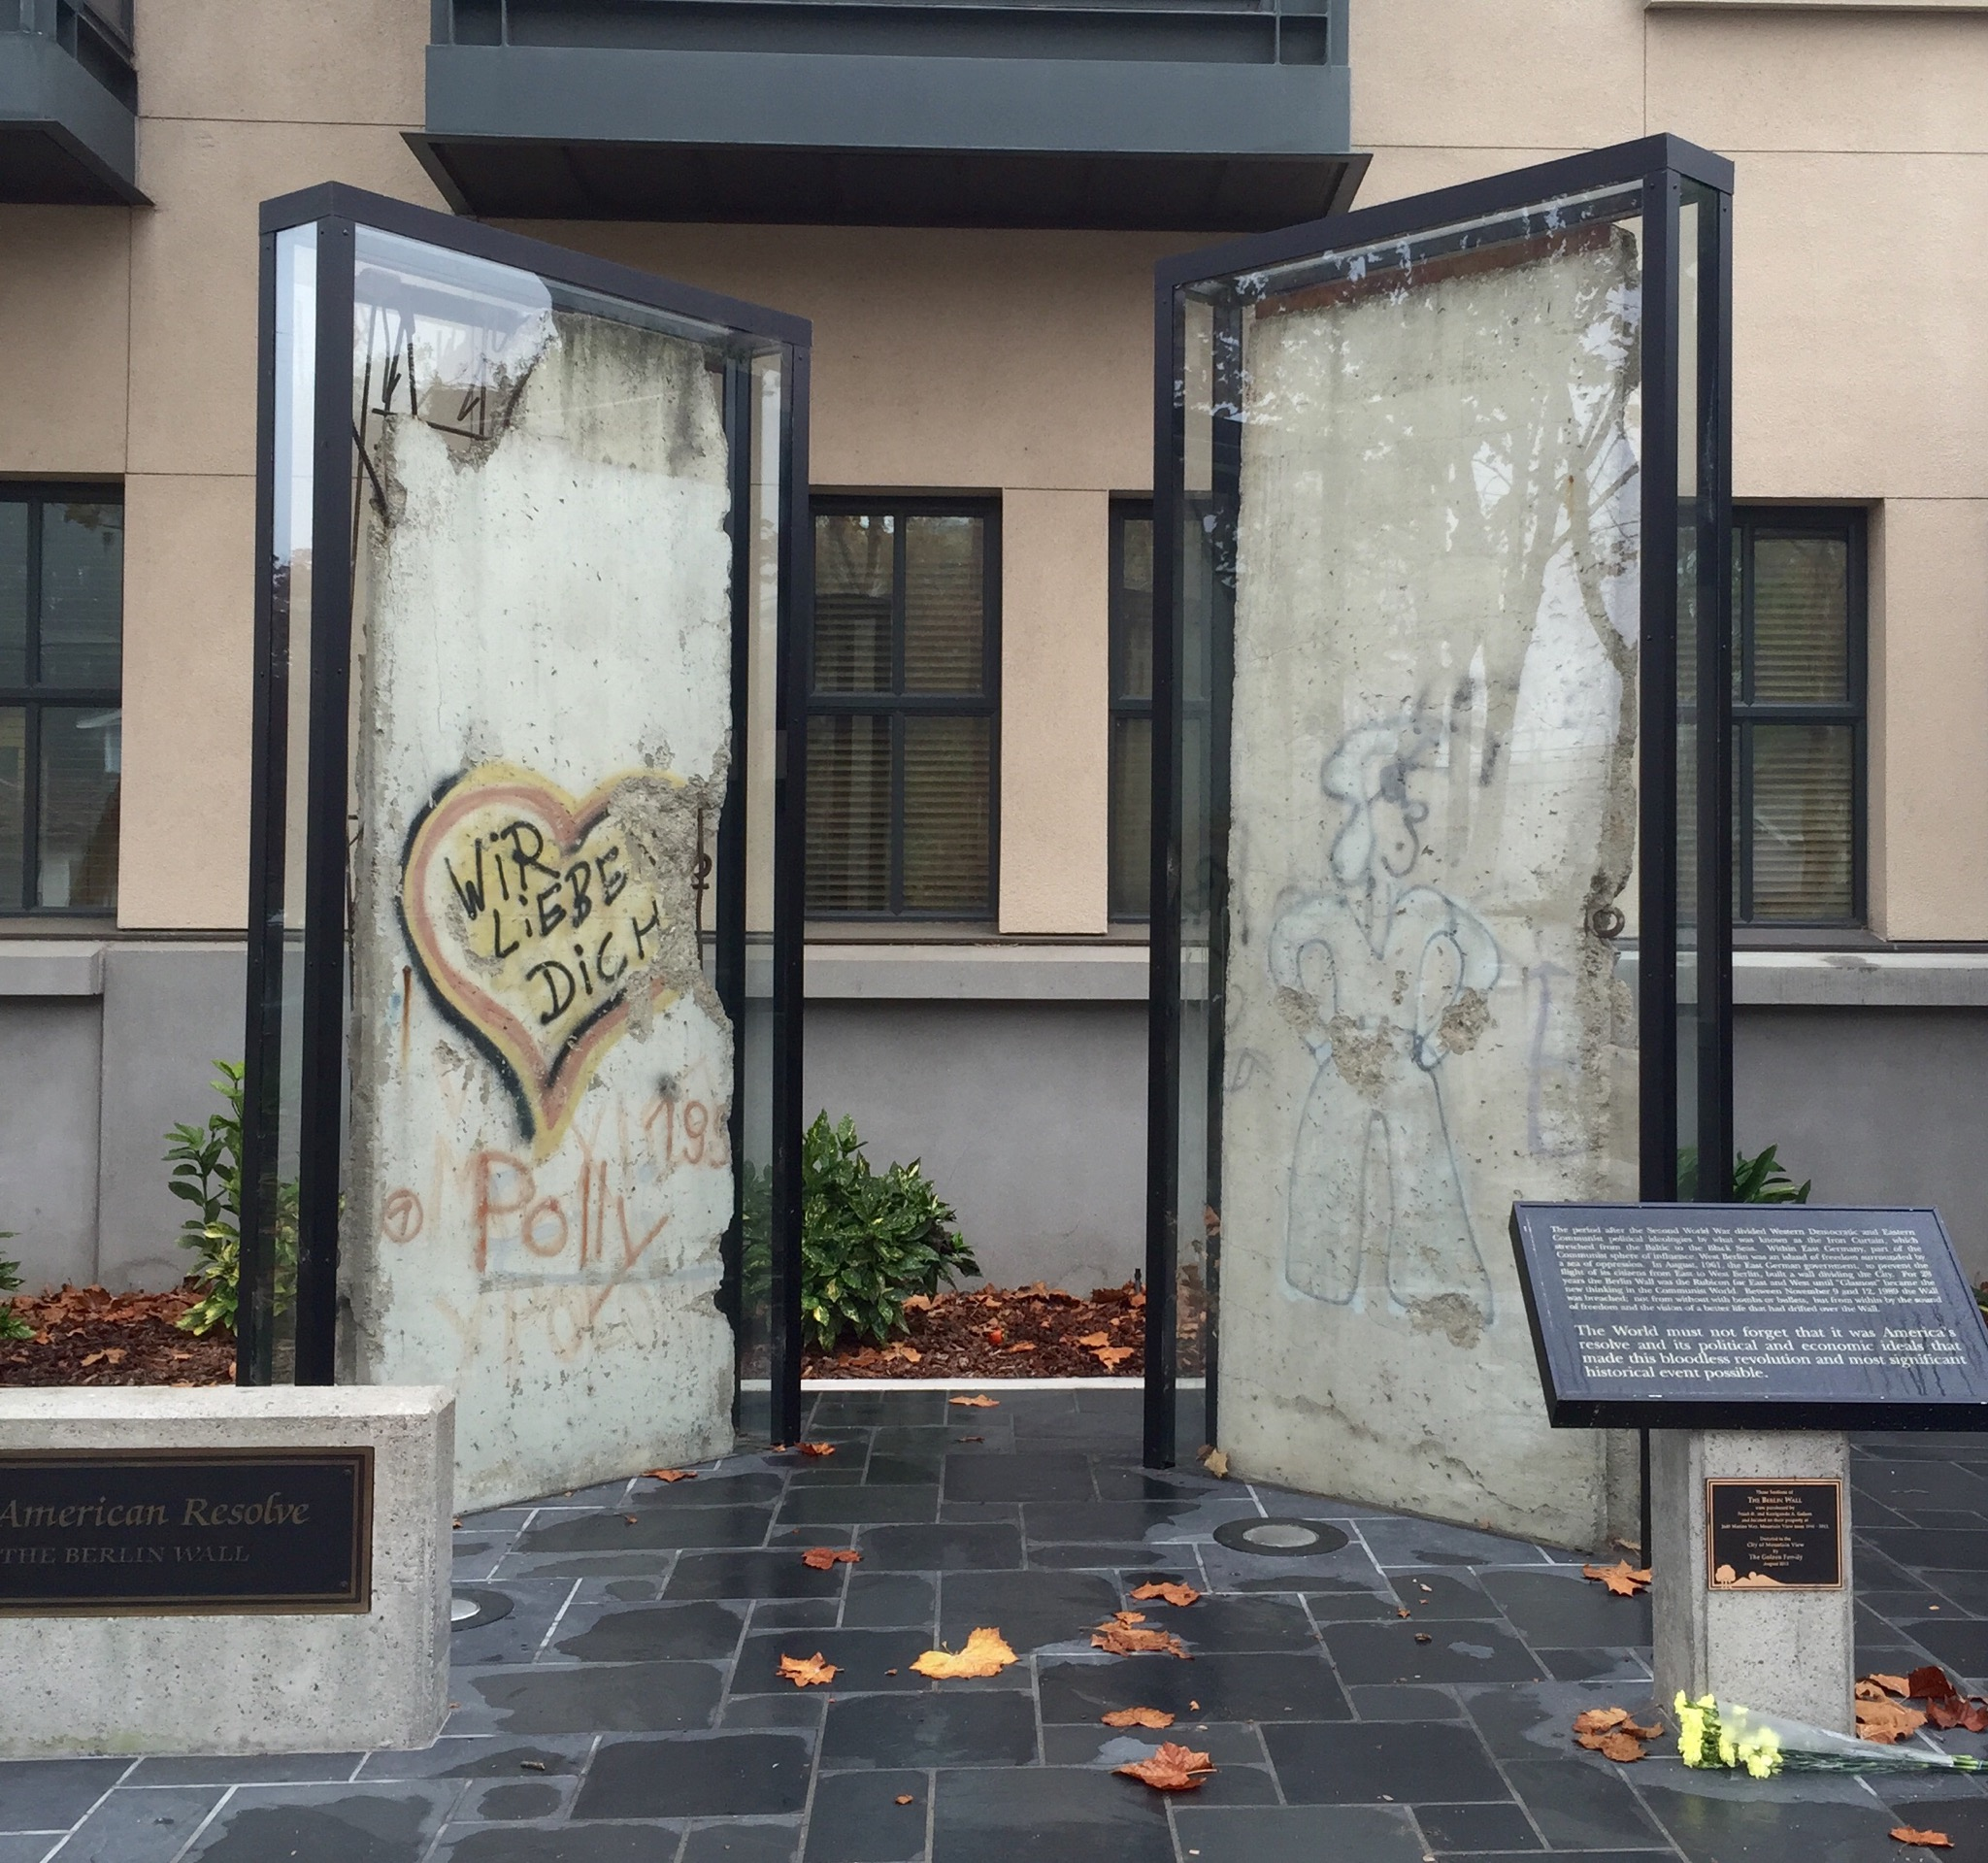 Berlin's Wall Fragments